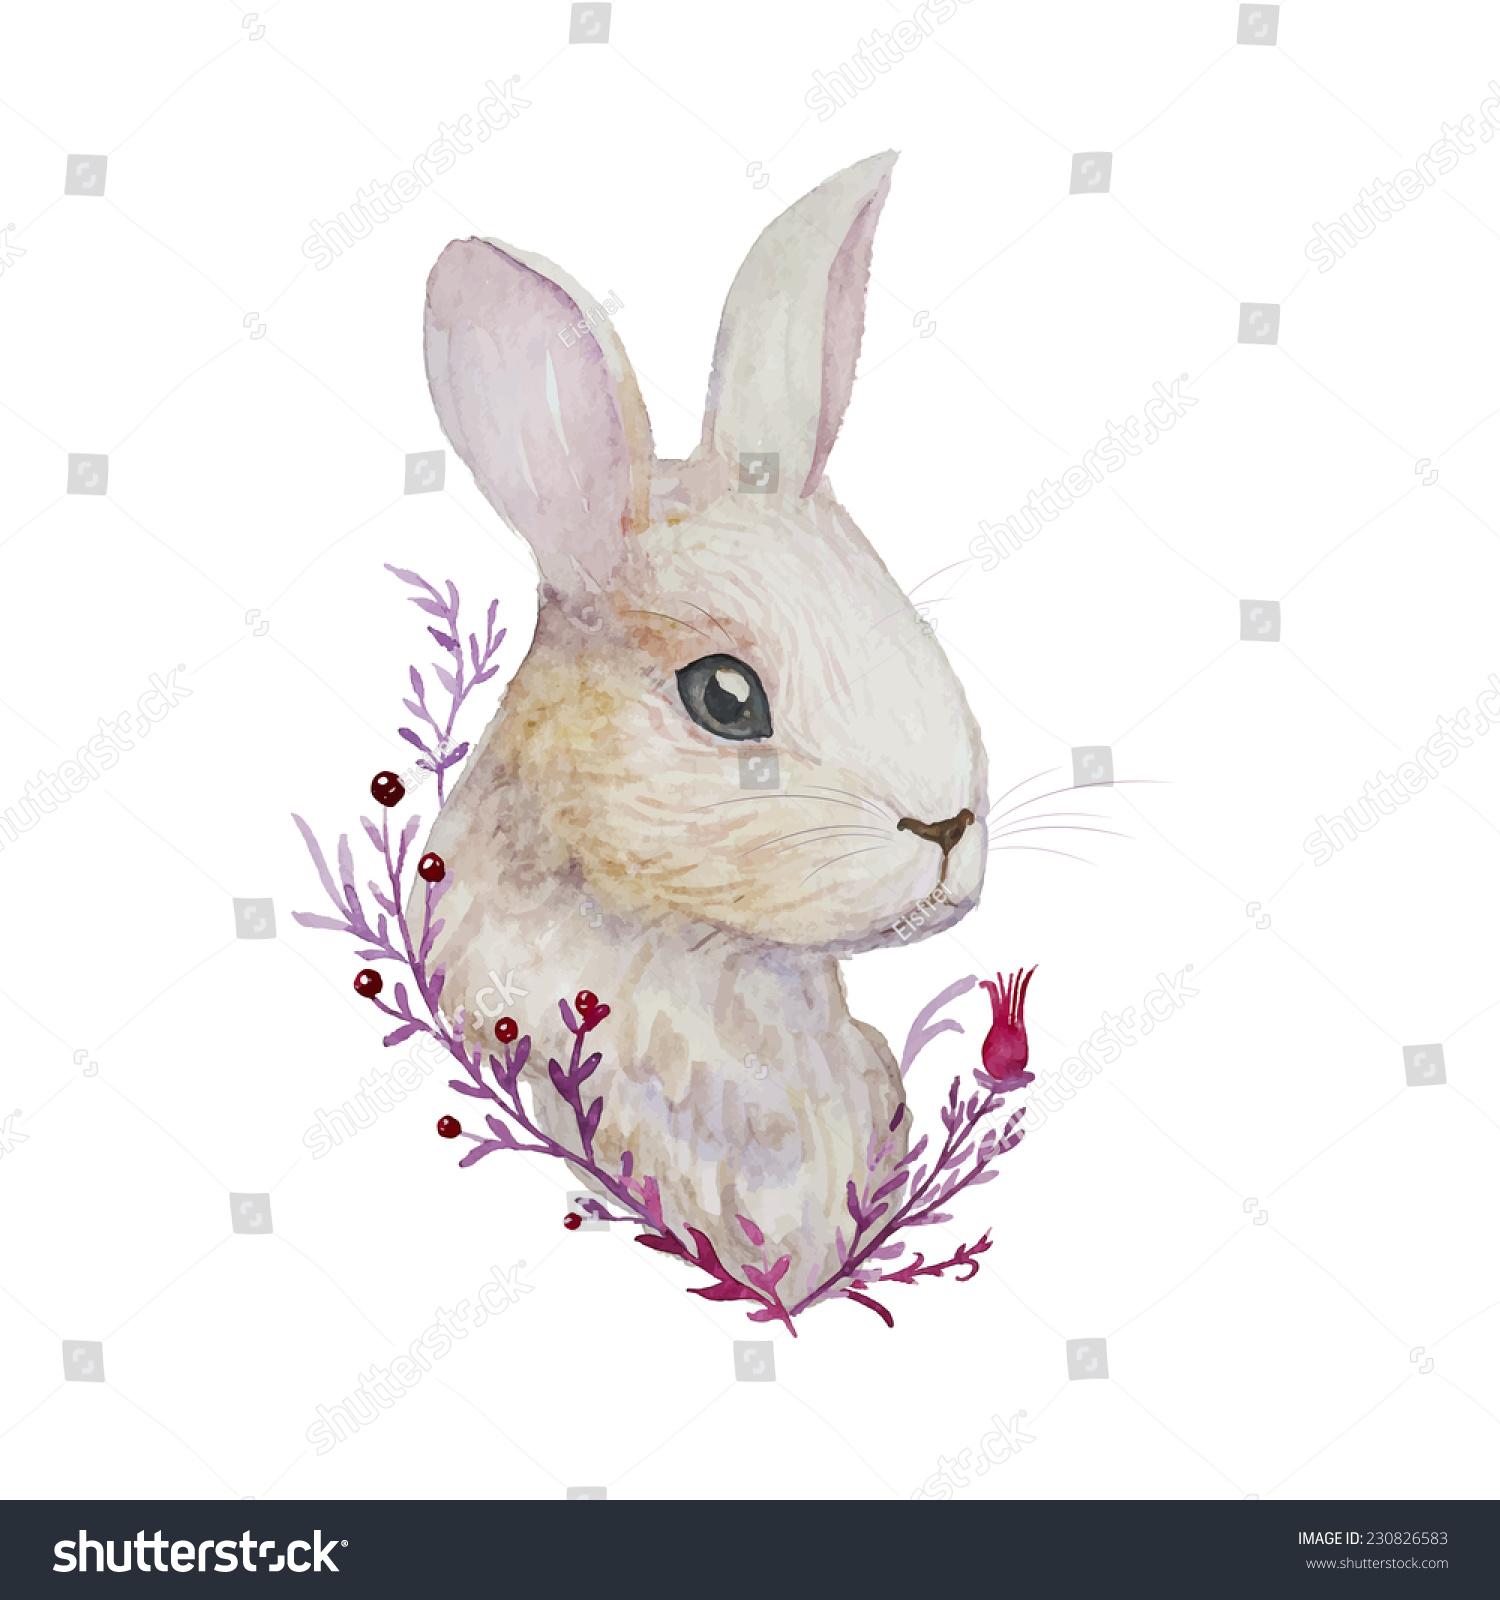 Realistic rabbit illustration - photo#3